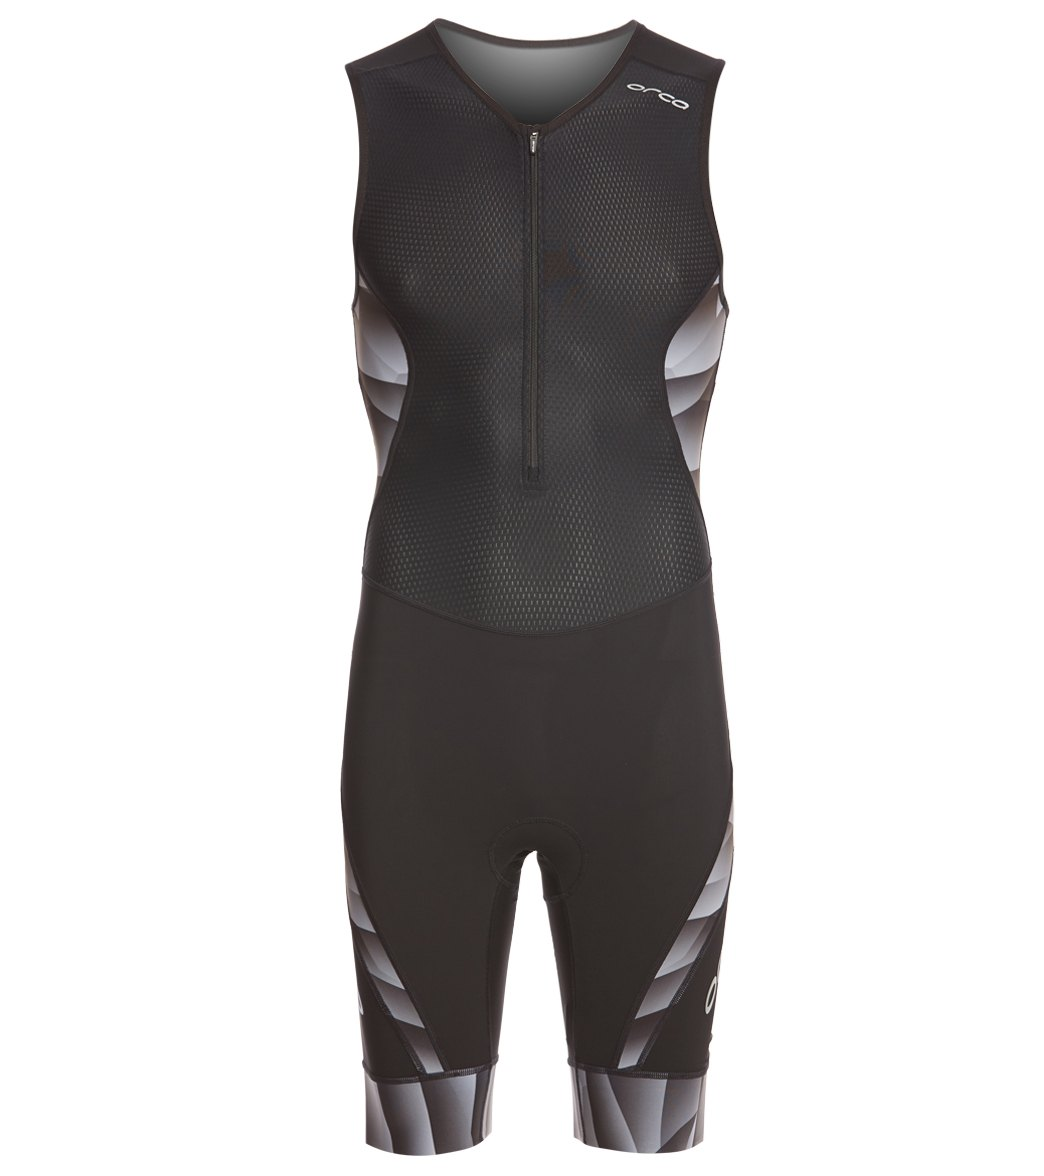 93539335c Orca Men s 226 Race Suit at SwimOutlet.com - Free Shipping